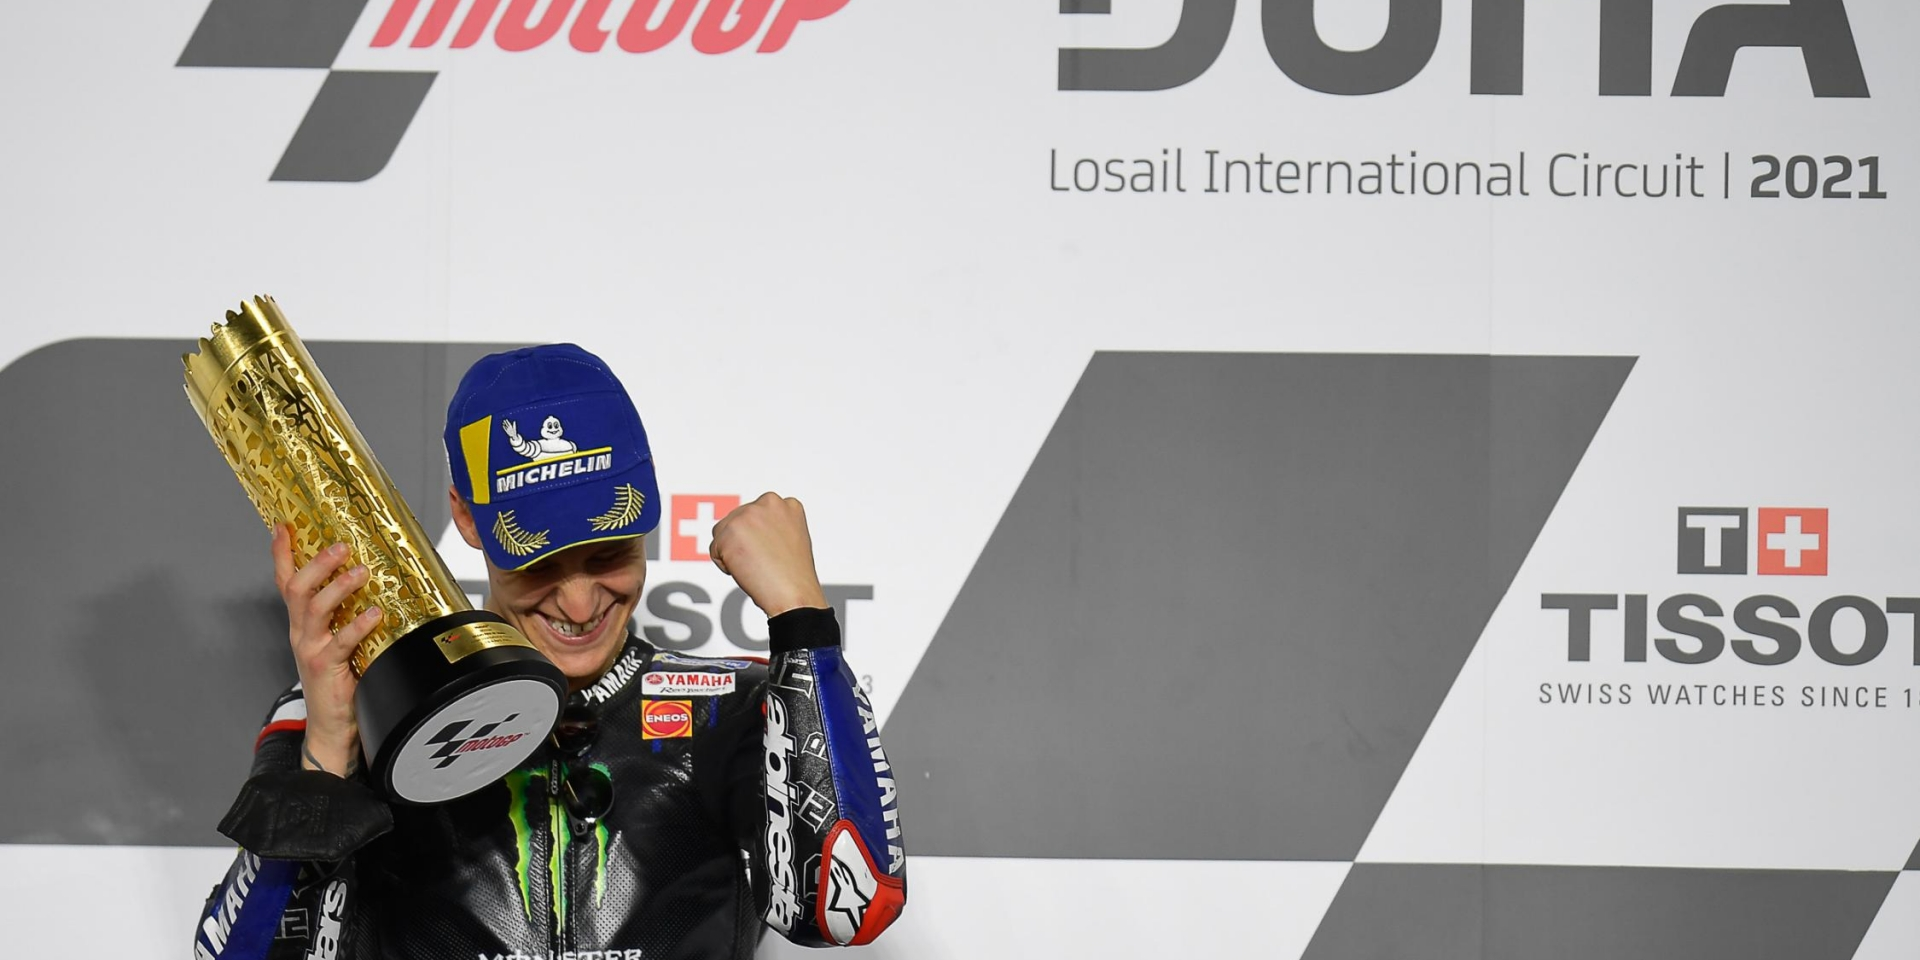 YAMAHA連拿兩冠!Fabio Quartararo:這一勝比去年的勝利更讓我充滿信心!